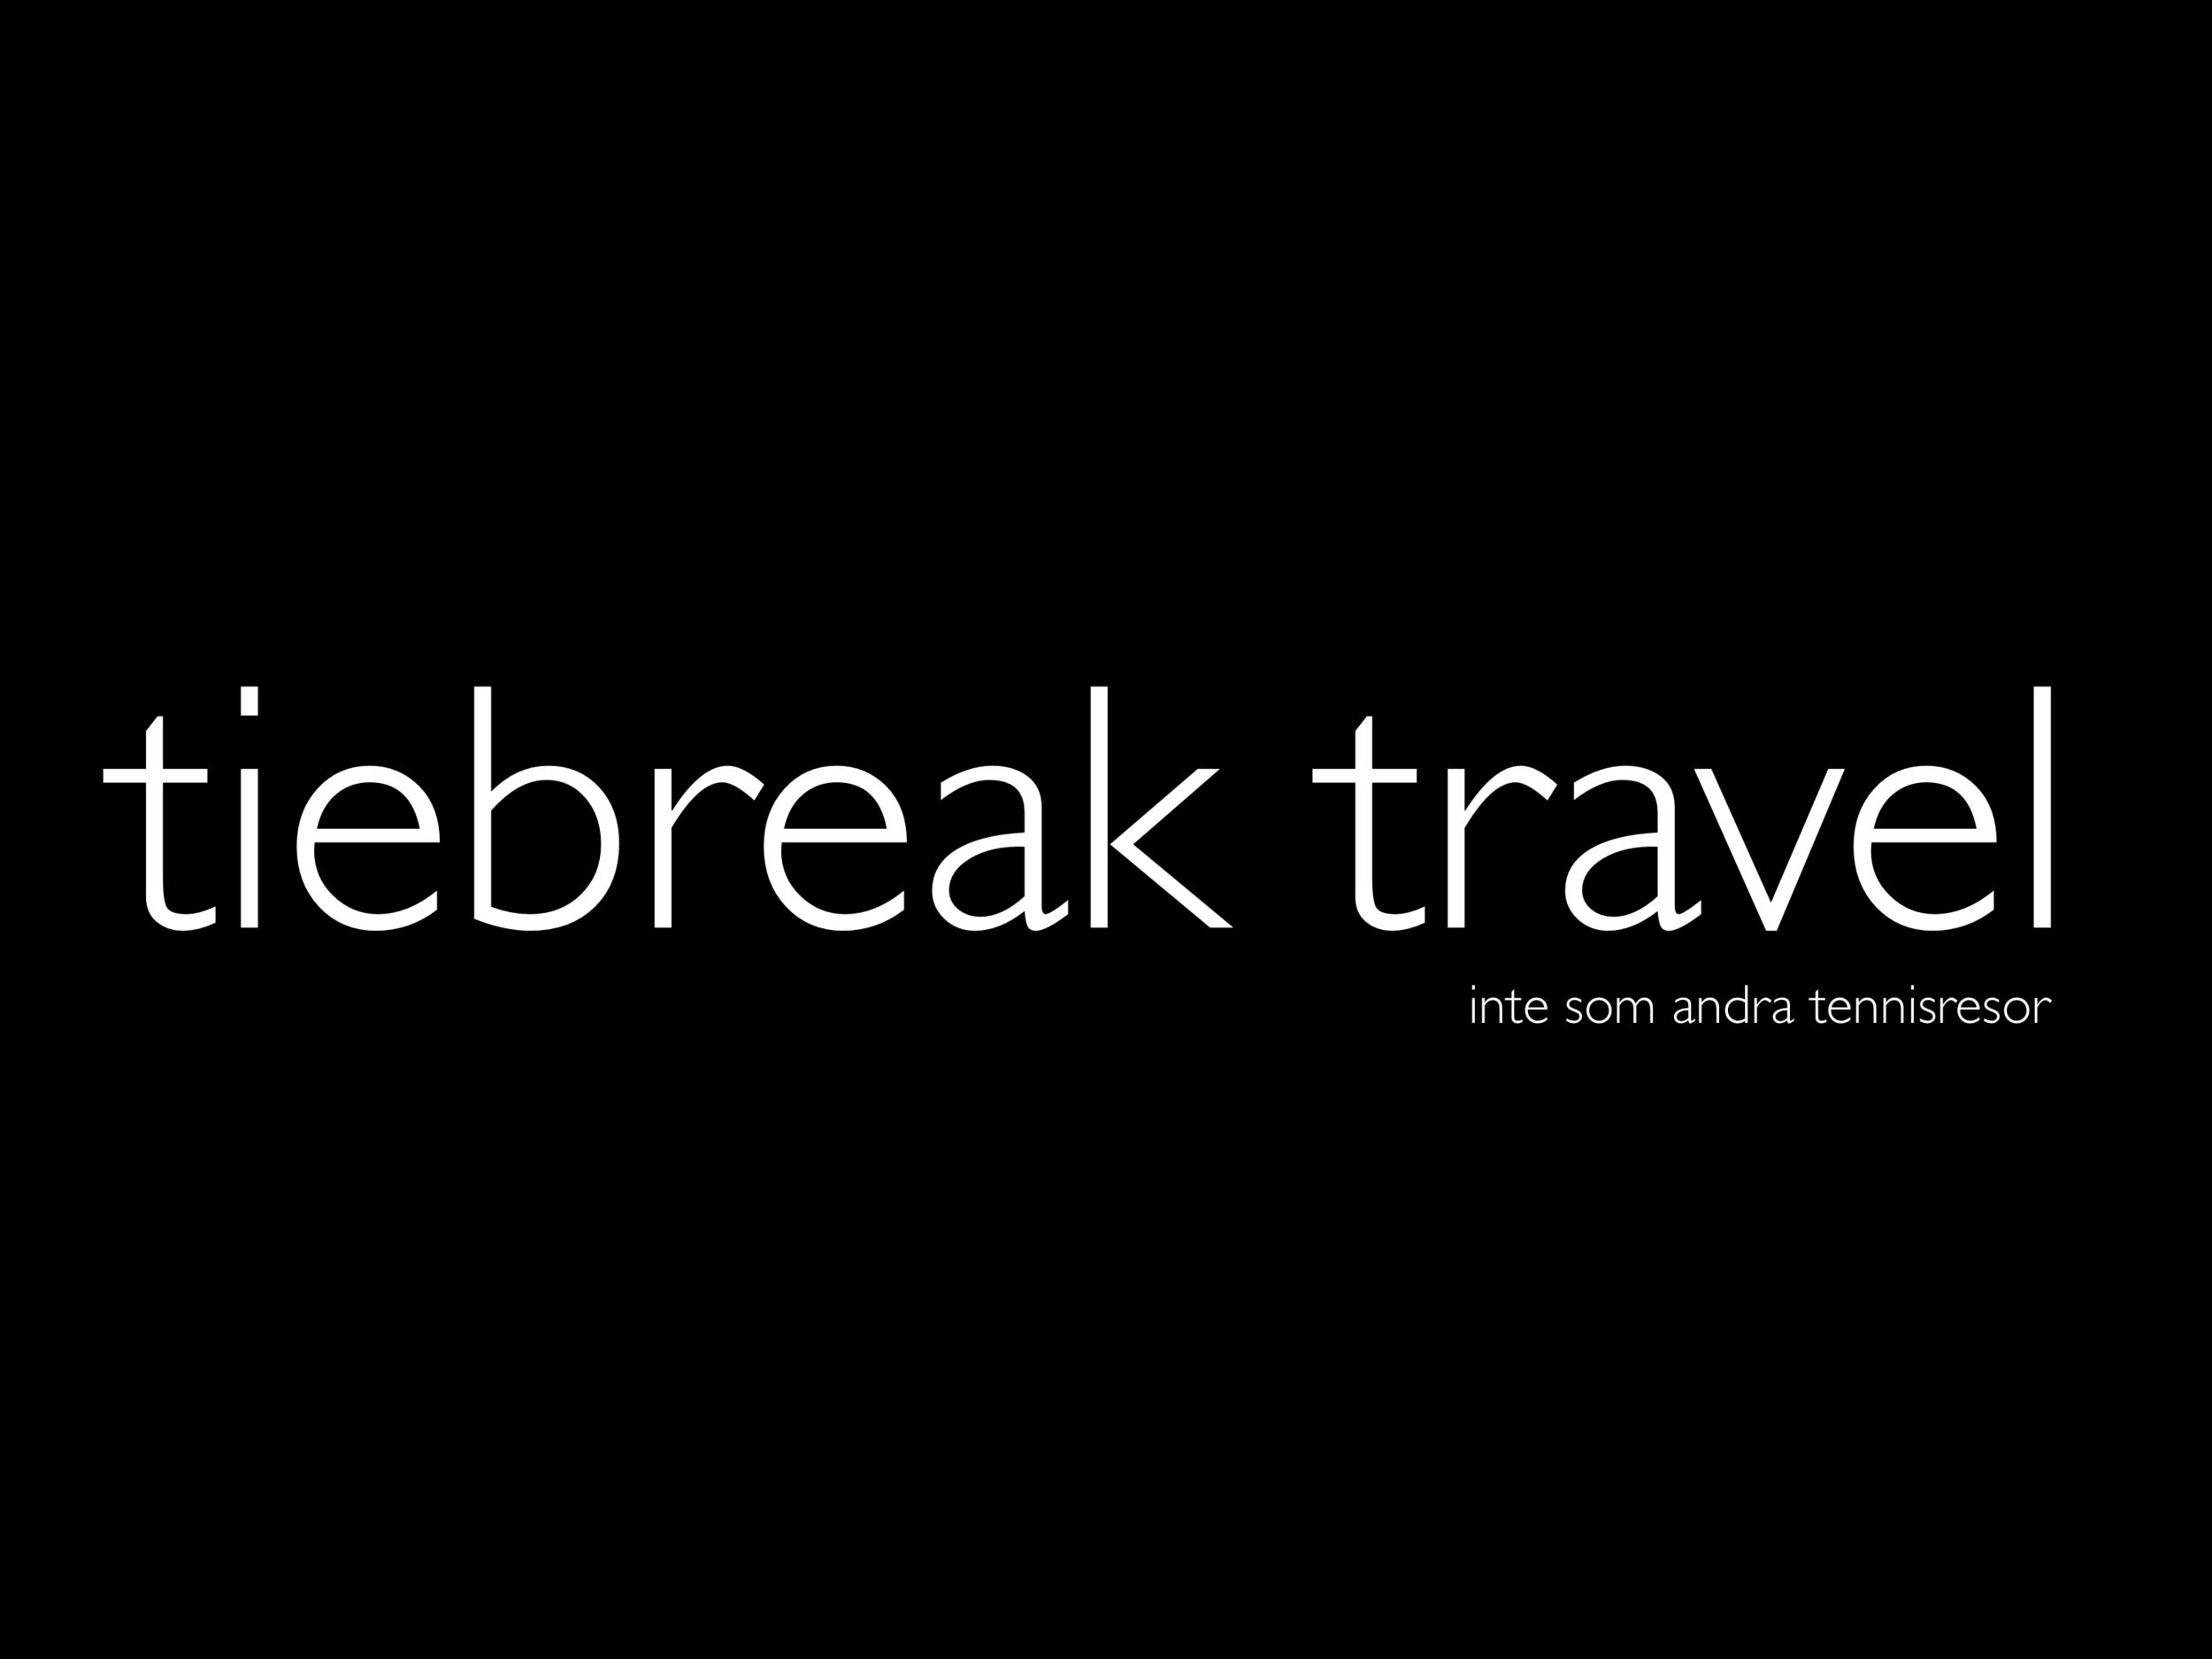 Tiebreak Travel logo svart payoff.png